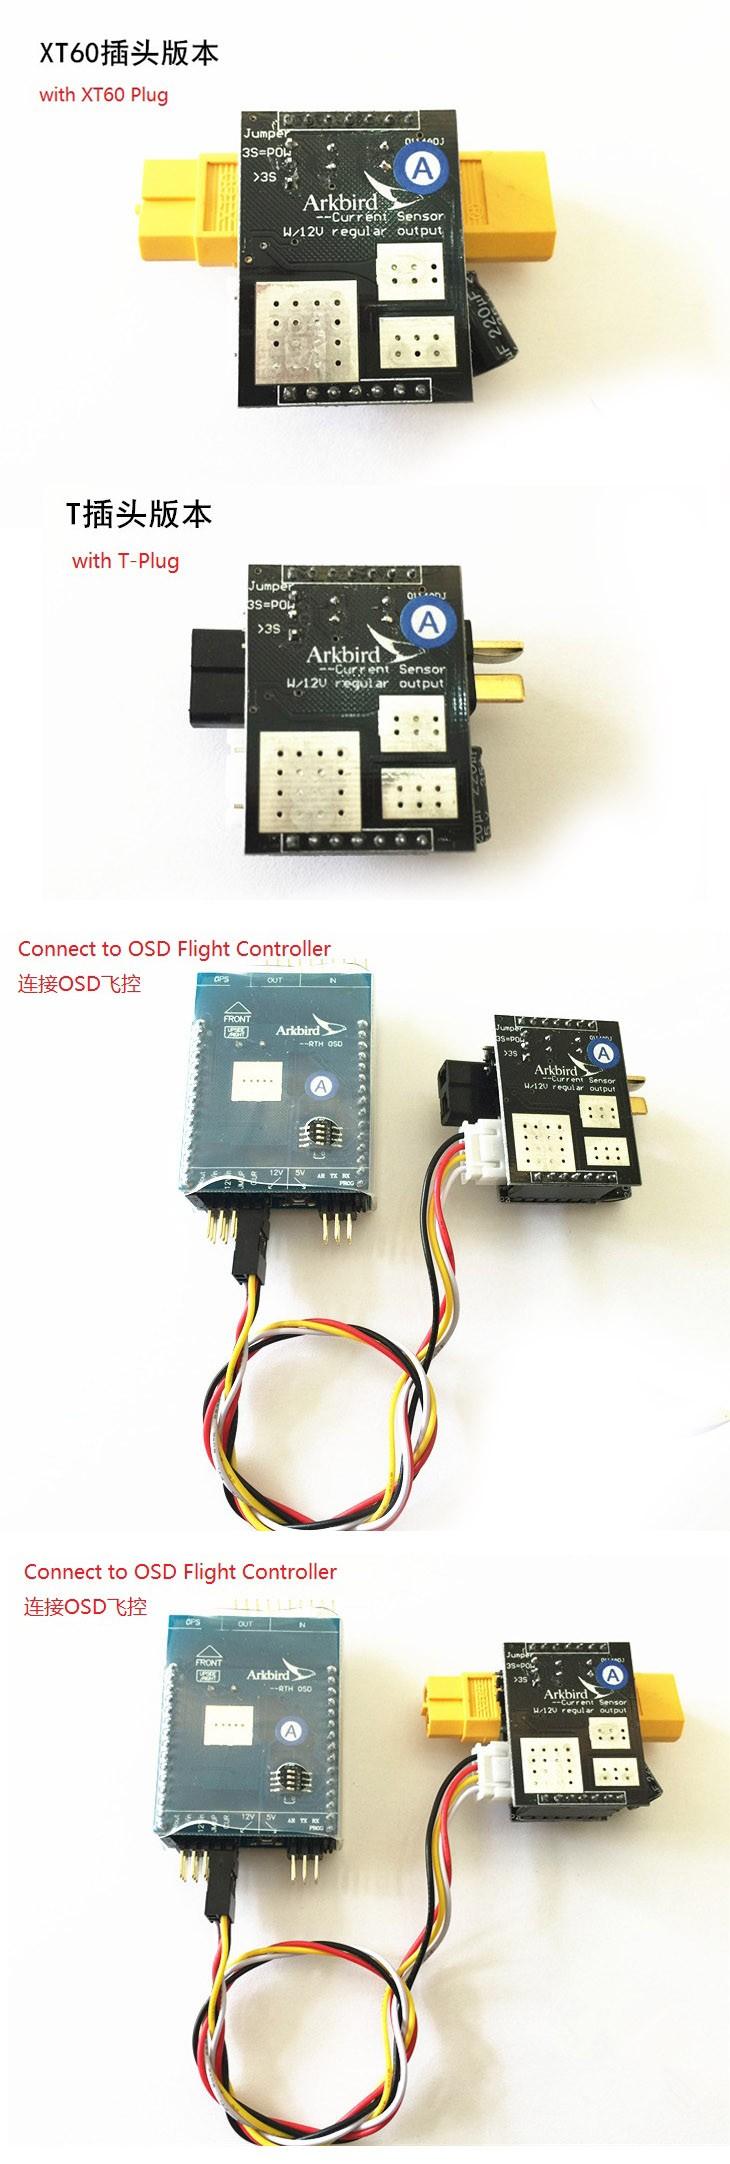 Arkbird Current Sensor With 12v Regulator Output Xt60 Or T Plug Currentsensorcircuit1jpg Ab 12dlj Ct 1